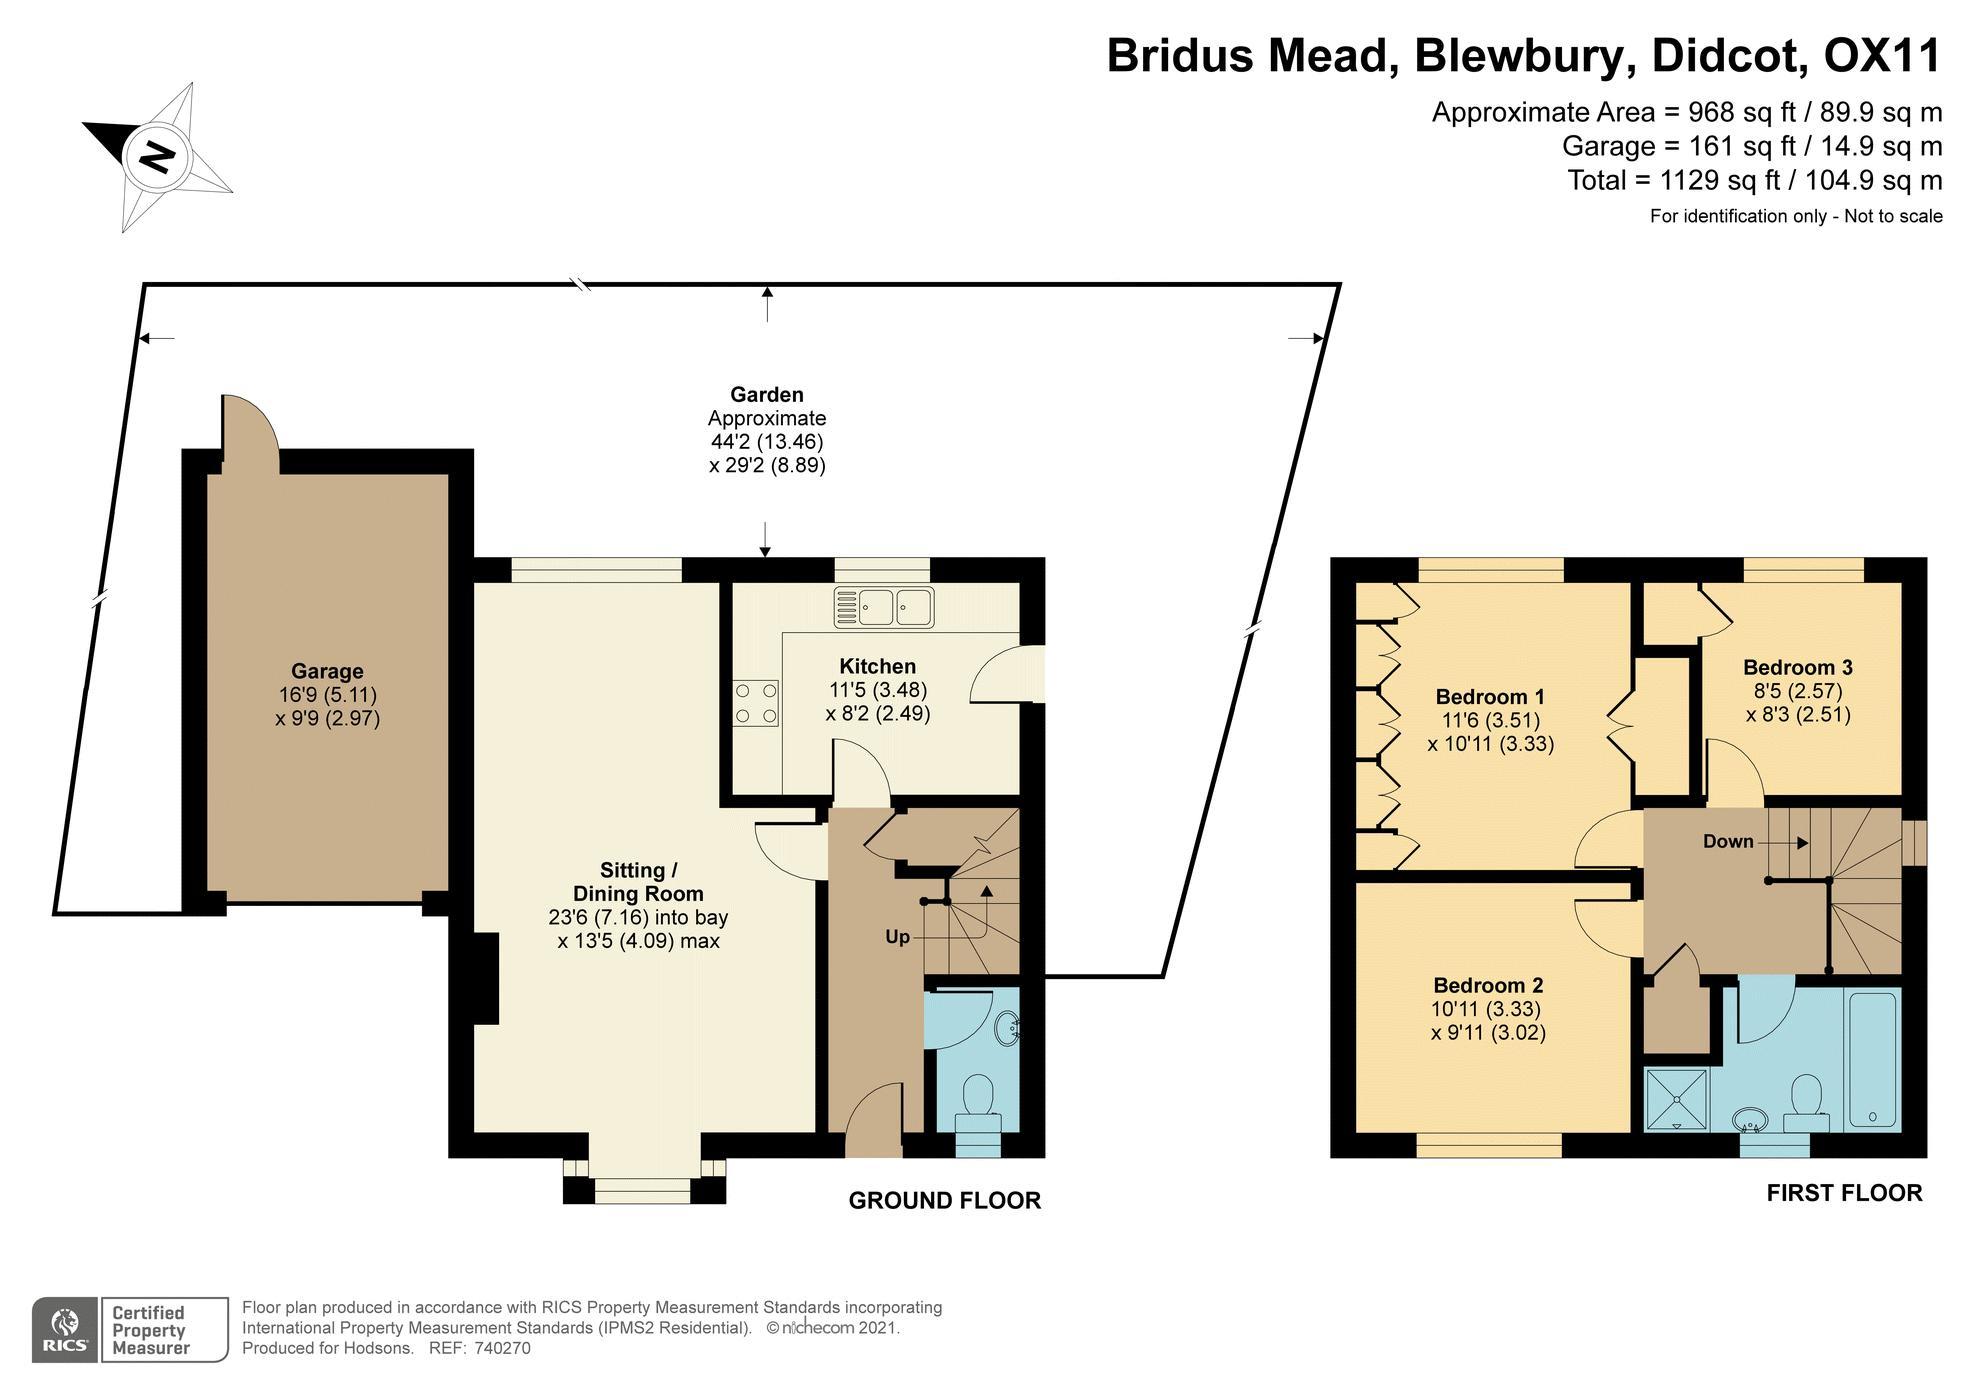 Bridus Mead Blewbury